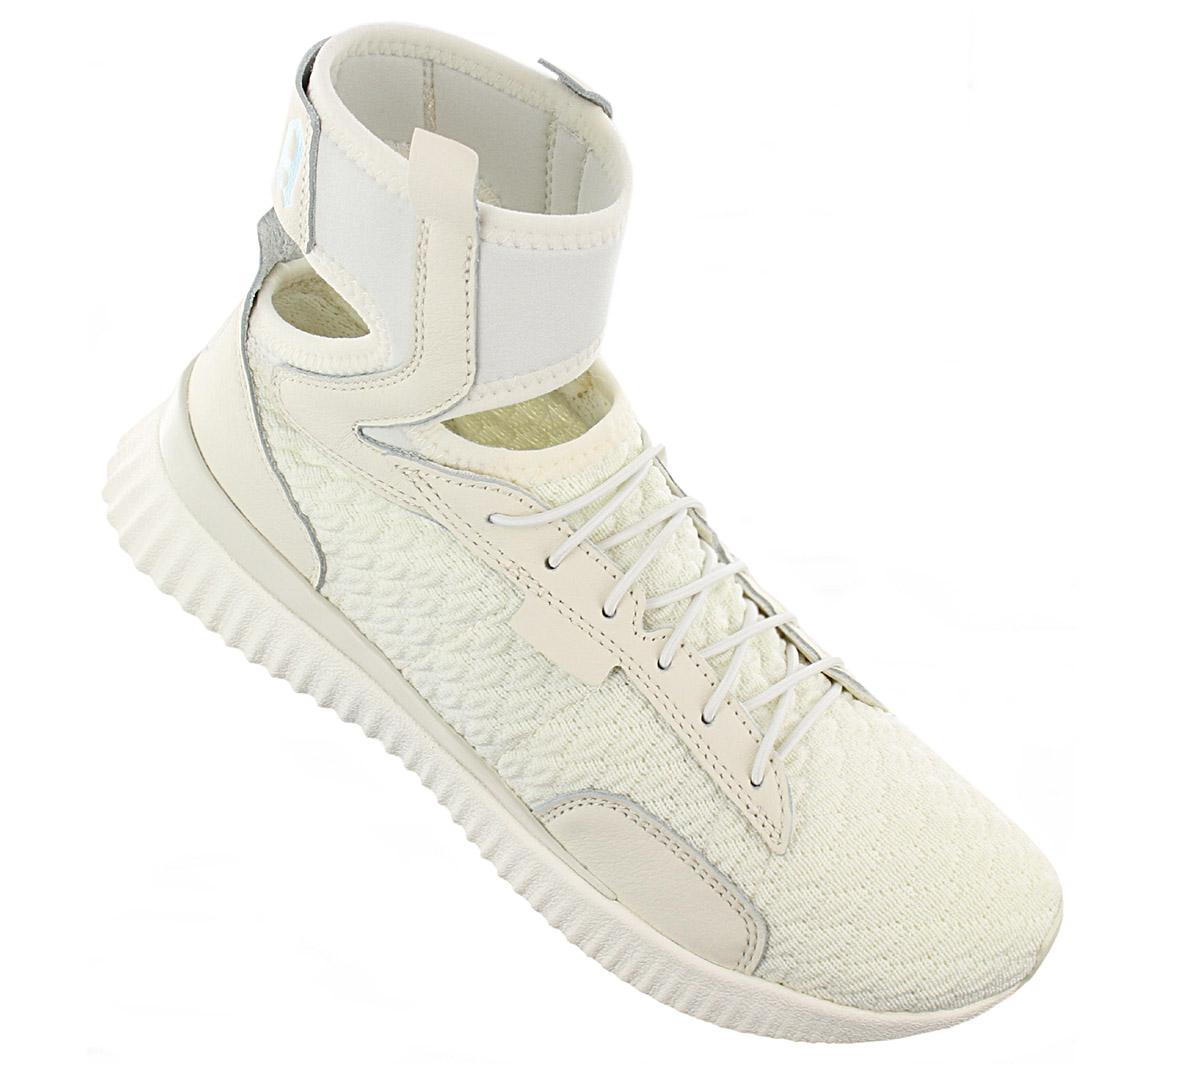 NEW FENTY x Puma by Rihanna Trainer Mid Geo 191231-01 Women`s shoes Trainers Sne